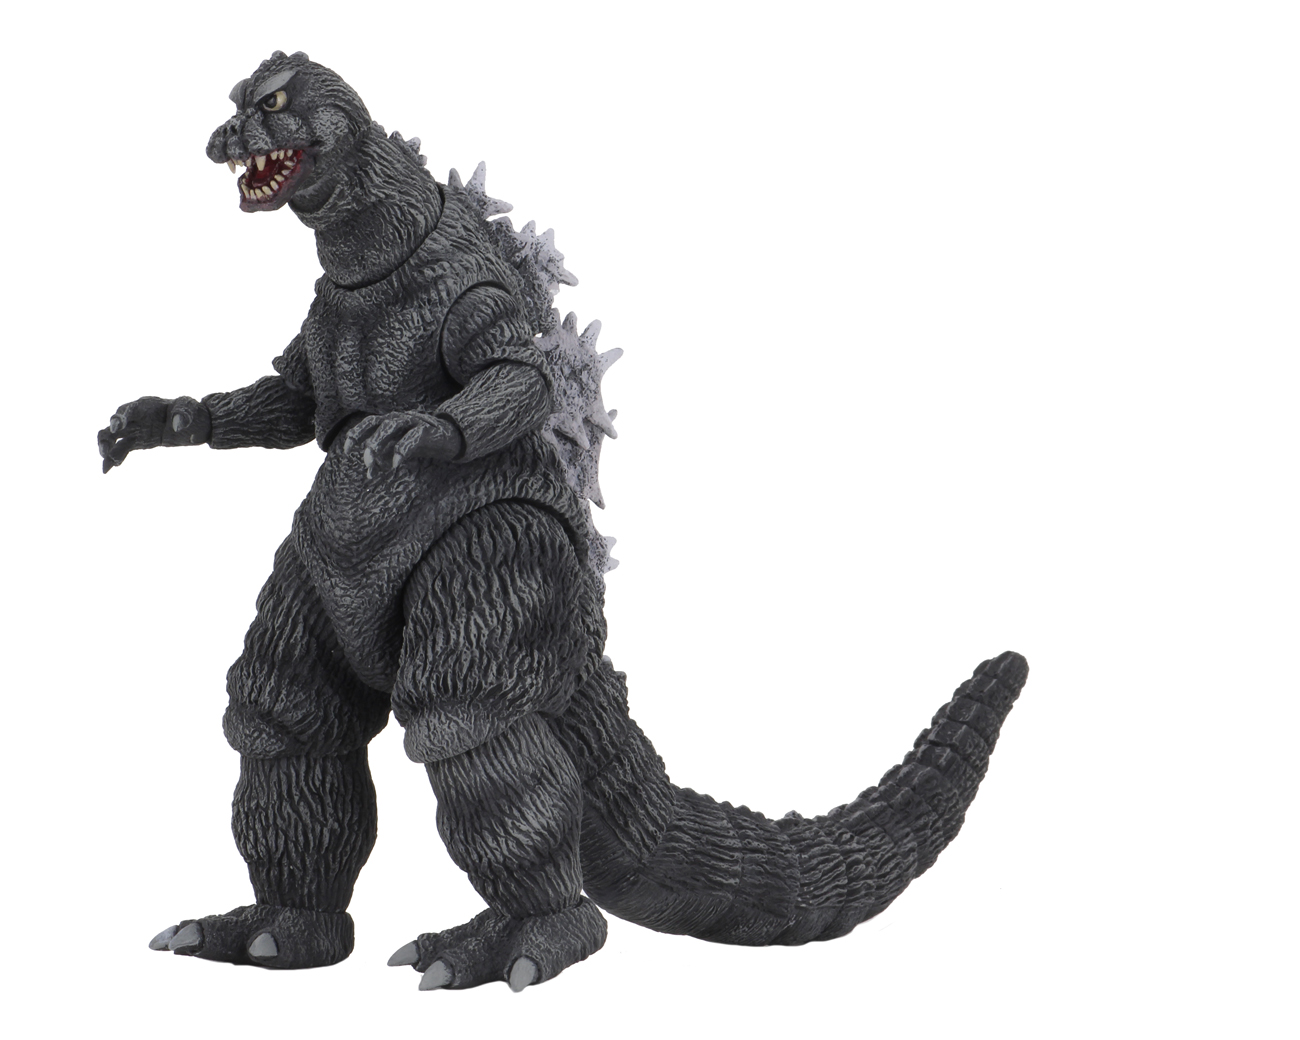 "Series 1 Godzilla NECA Godzilla Action Figure 12/"" Head To Tail"